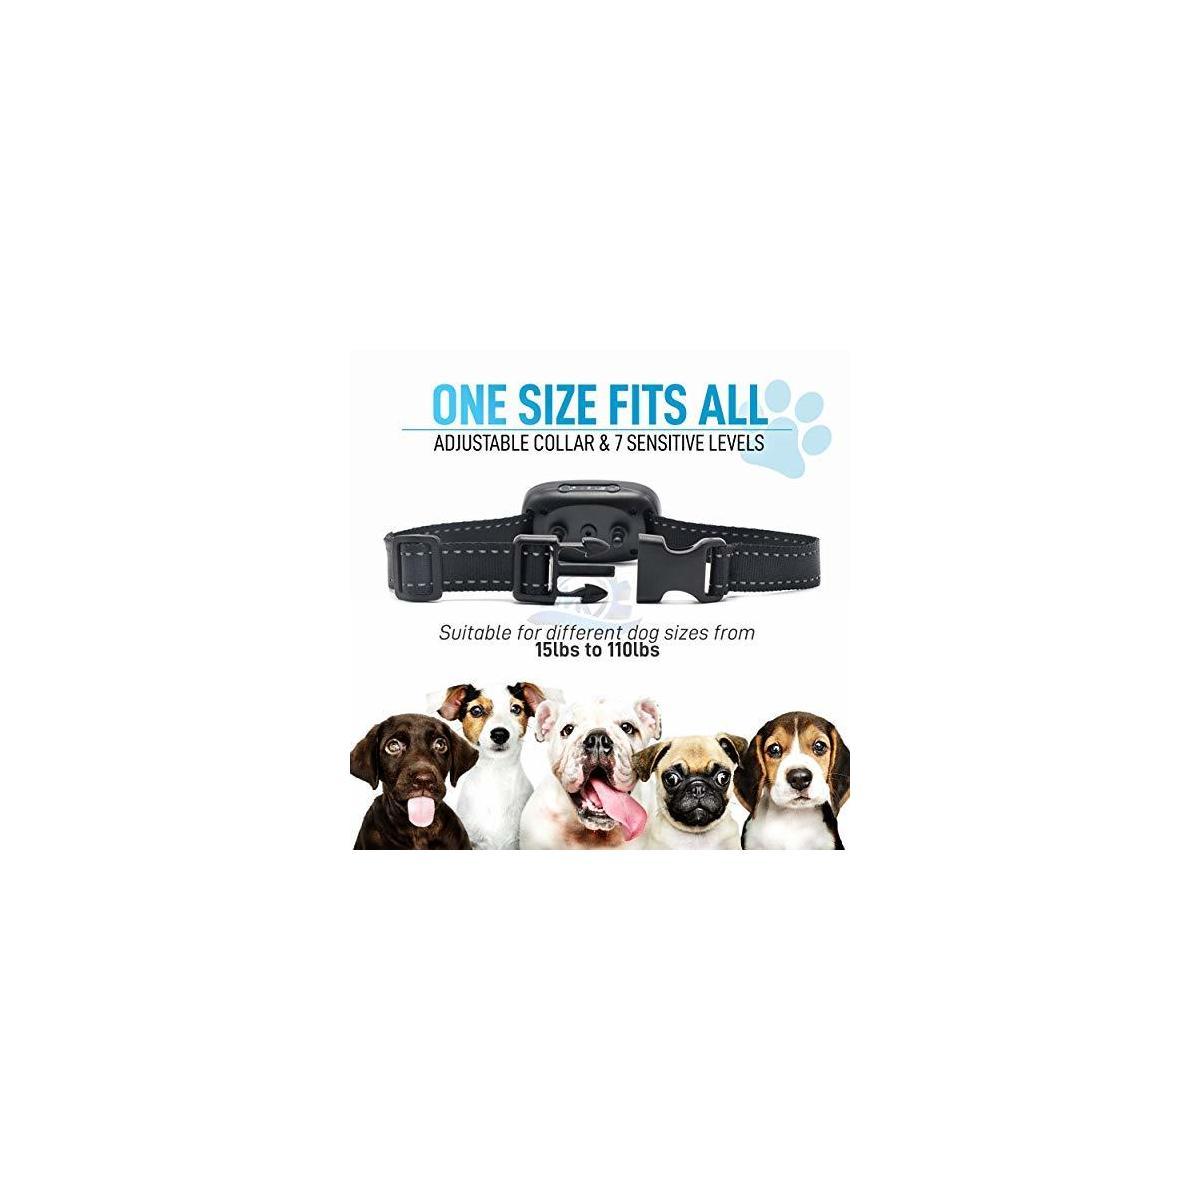 MK Global Bark Collar – Barking Dog Deterrent for Small,Medium,Large Dogs Vibration and Sound Mode - Humane Dog Barking Control Device No Shock Training Collar